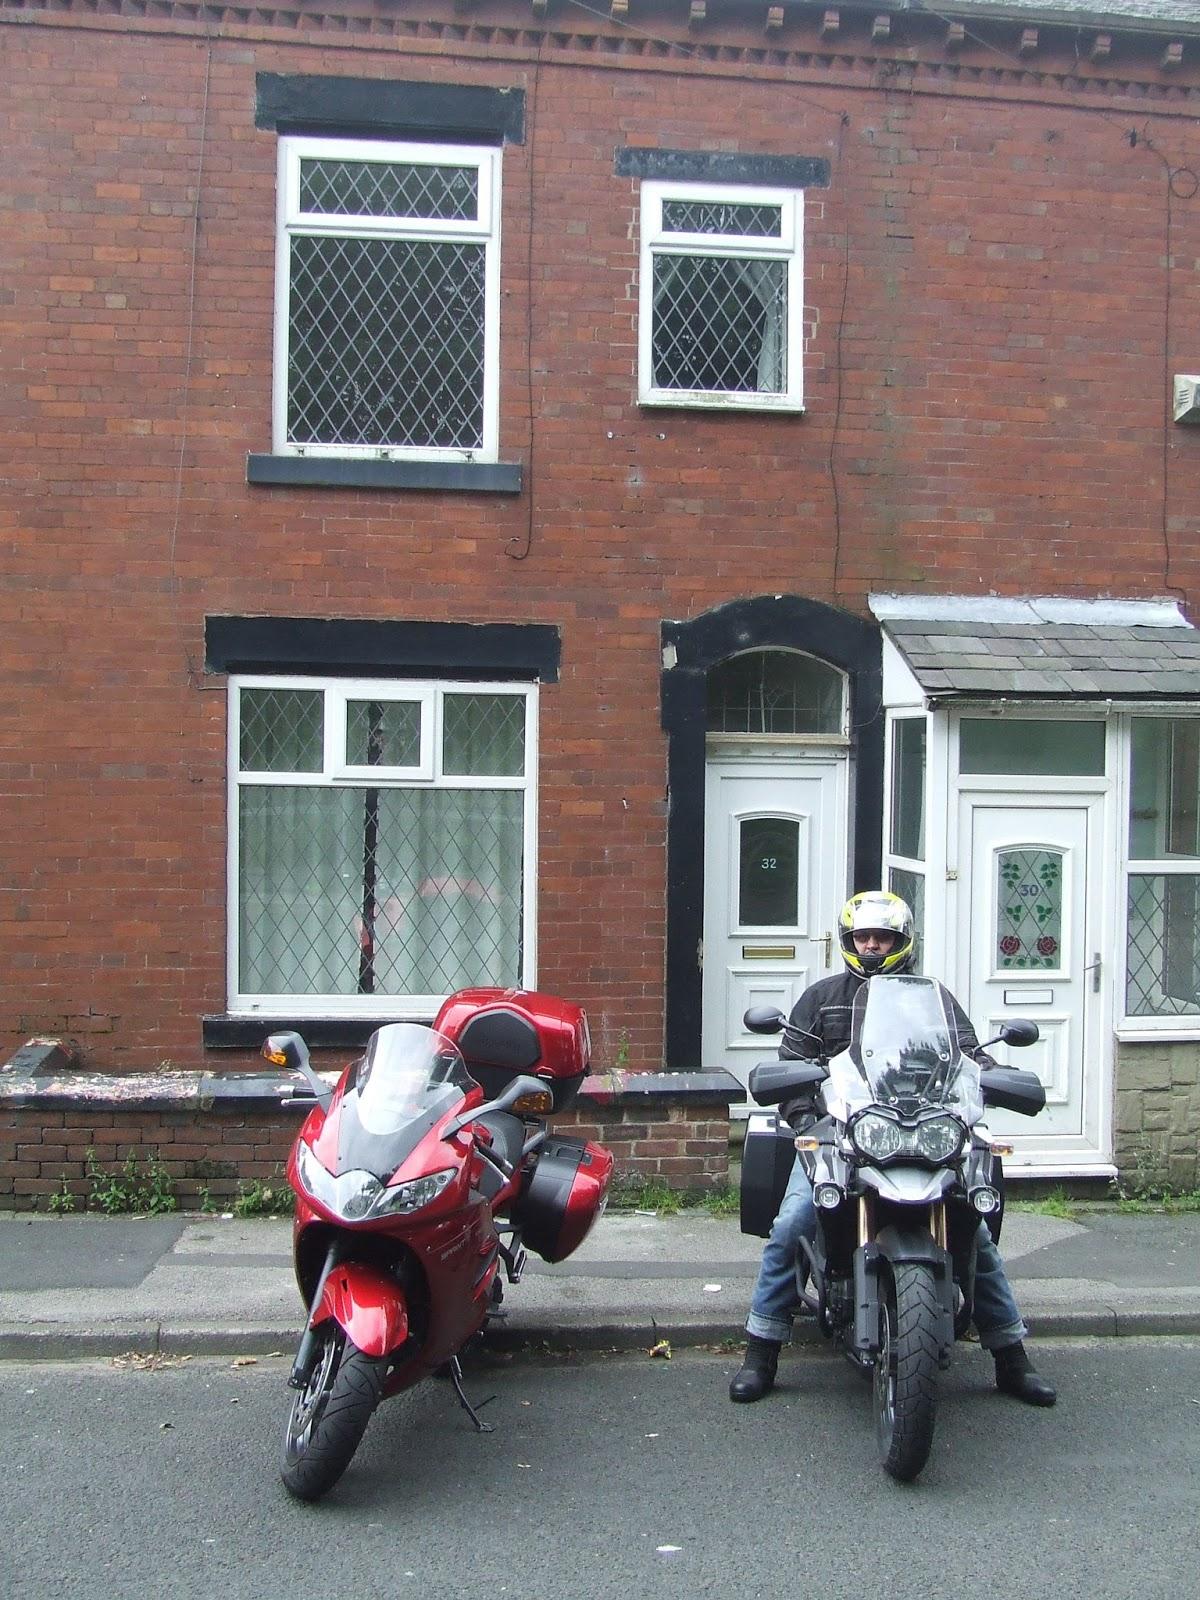 32 Bargap Road, Oldham, Lancashire - home to our Gran Hilda.